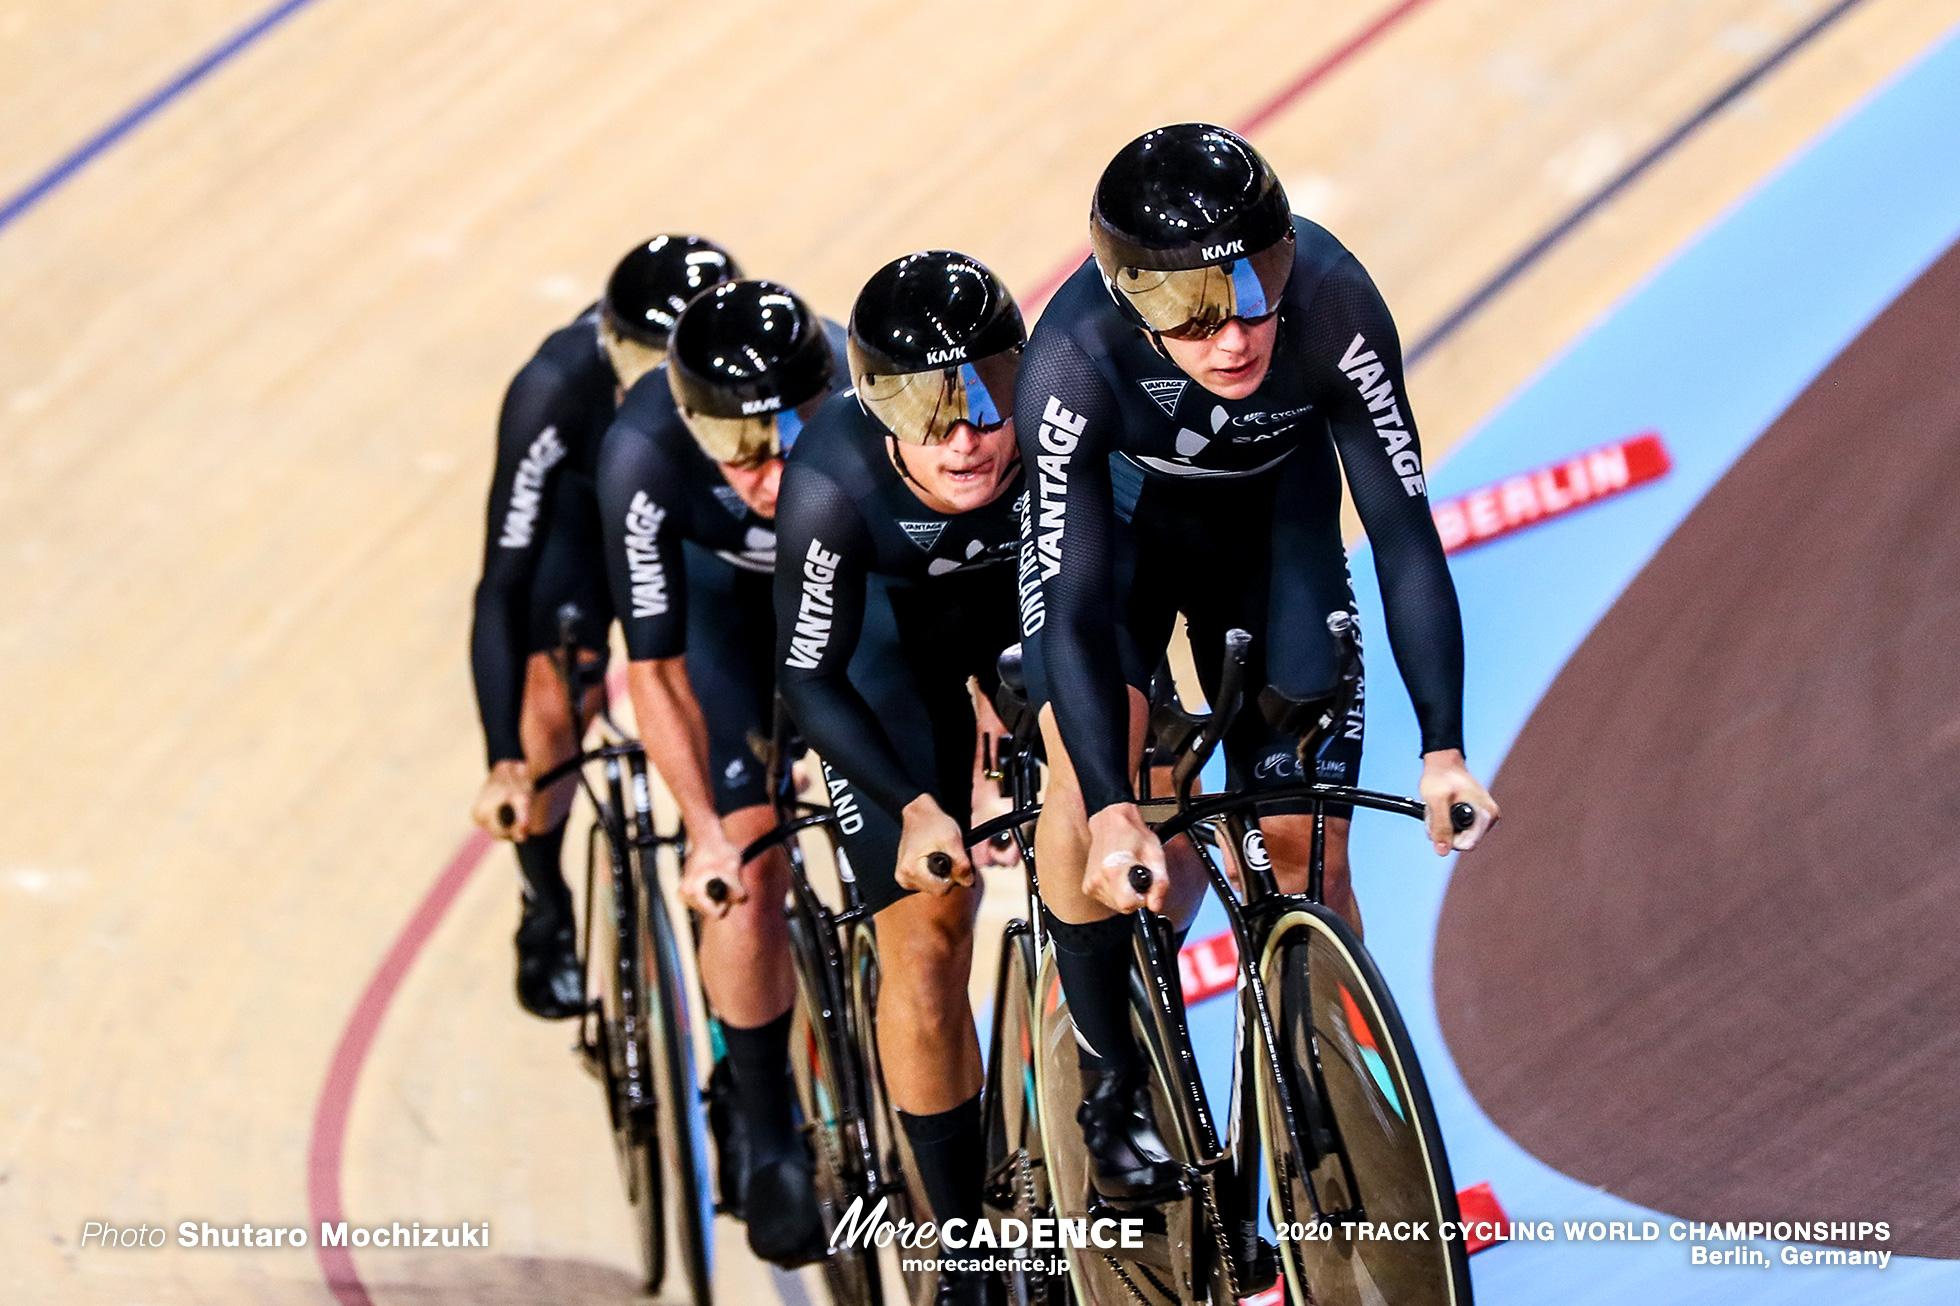 Final / Men's Team Pursuit / 2020 Track Cycling World Championships / New Zealand ニュージーランド / Campbell Stewart キャンベル・スチュワート, Corbin Strong コービン・ストロング, Aaron Gate アーロン・ゲイト, Jordan Kerby ジョーダン・カービー